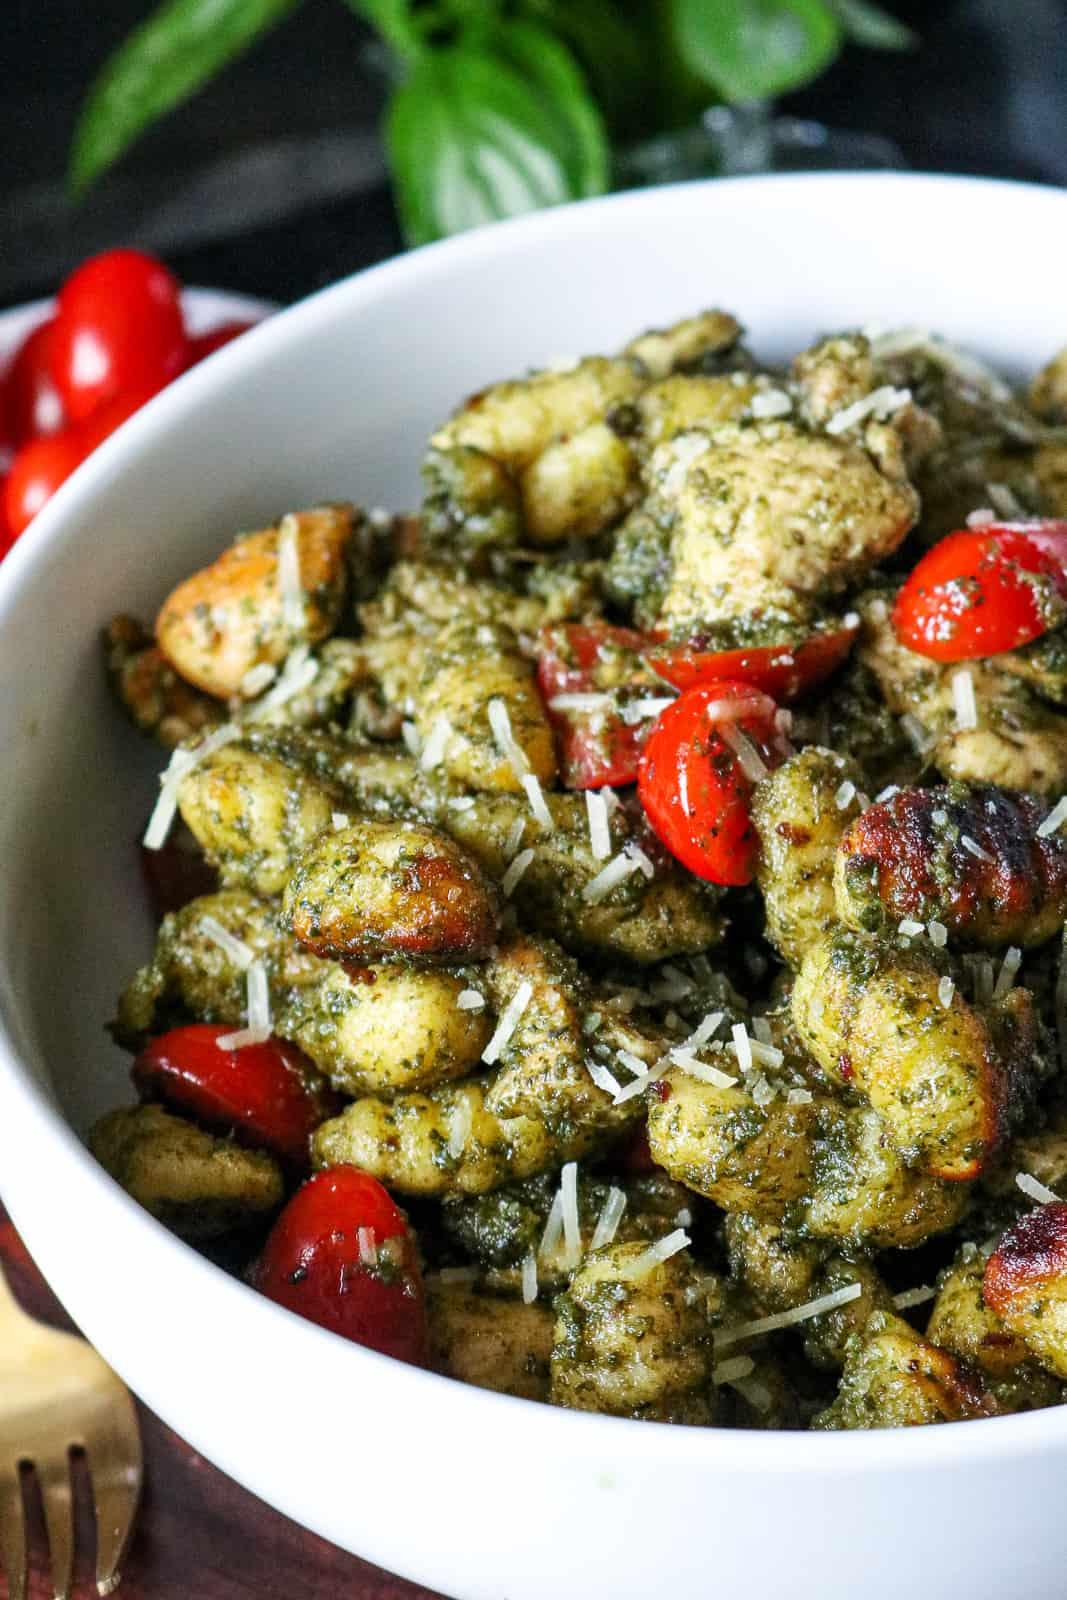 Pesto Chicken Basil Gnocchi with Tomatoes